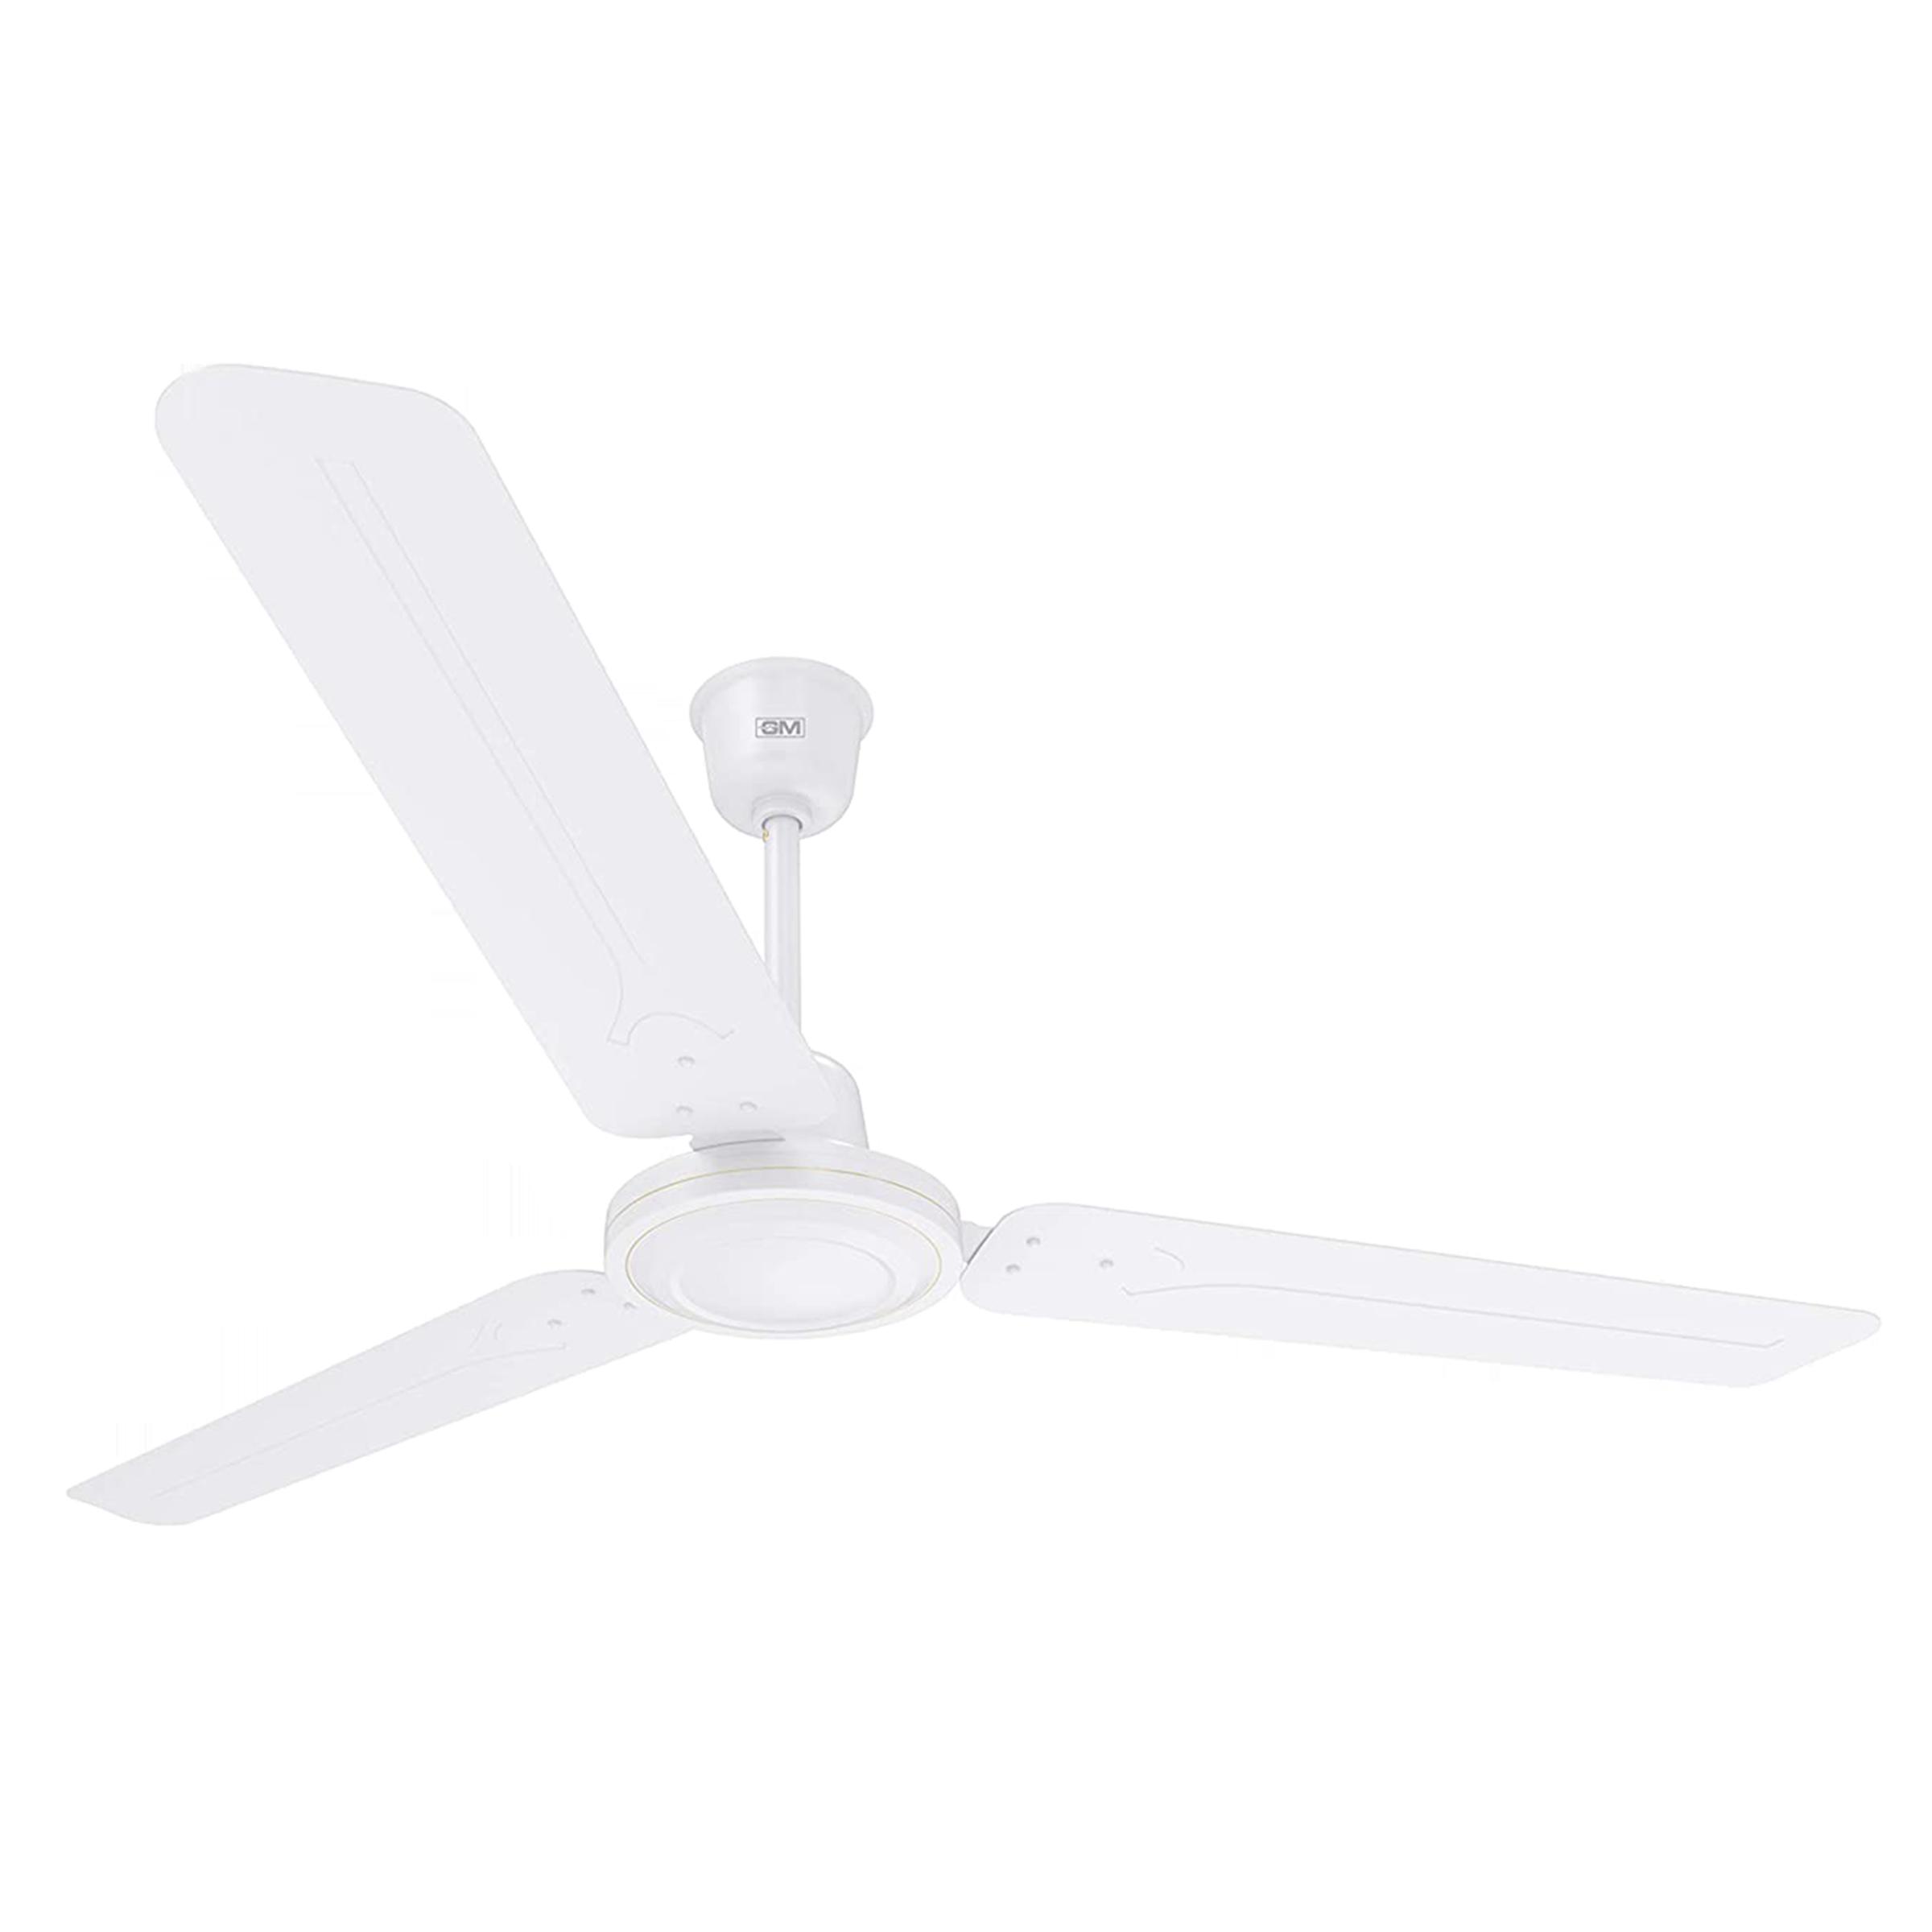 GM Breeze 120 cm Sweep 3 Blade Ceiling Fan (Energy Efficient, CFB480008WHGL, White)_1